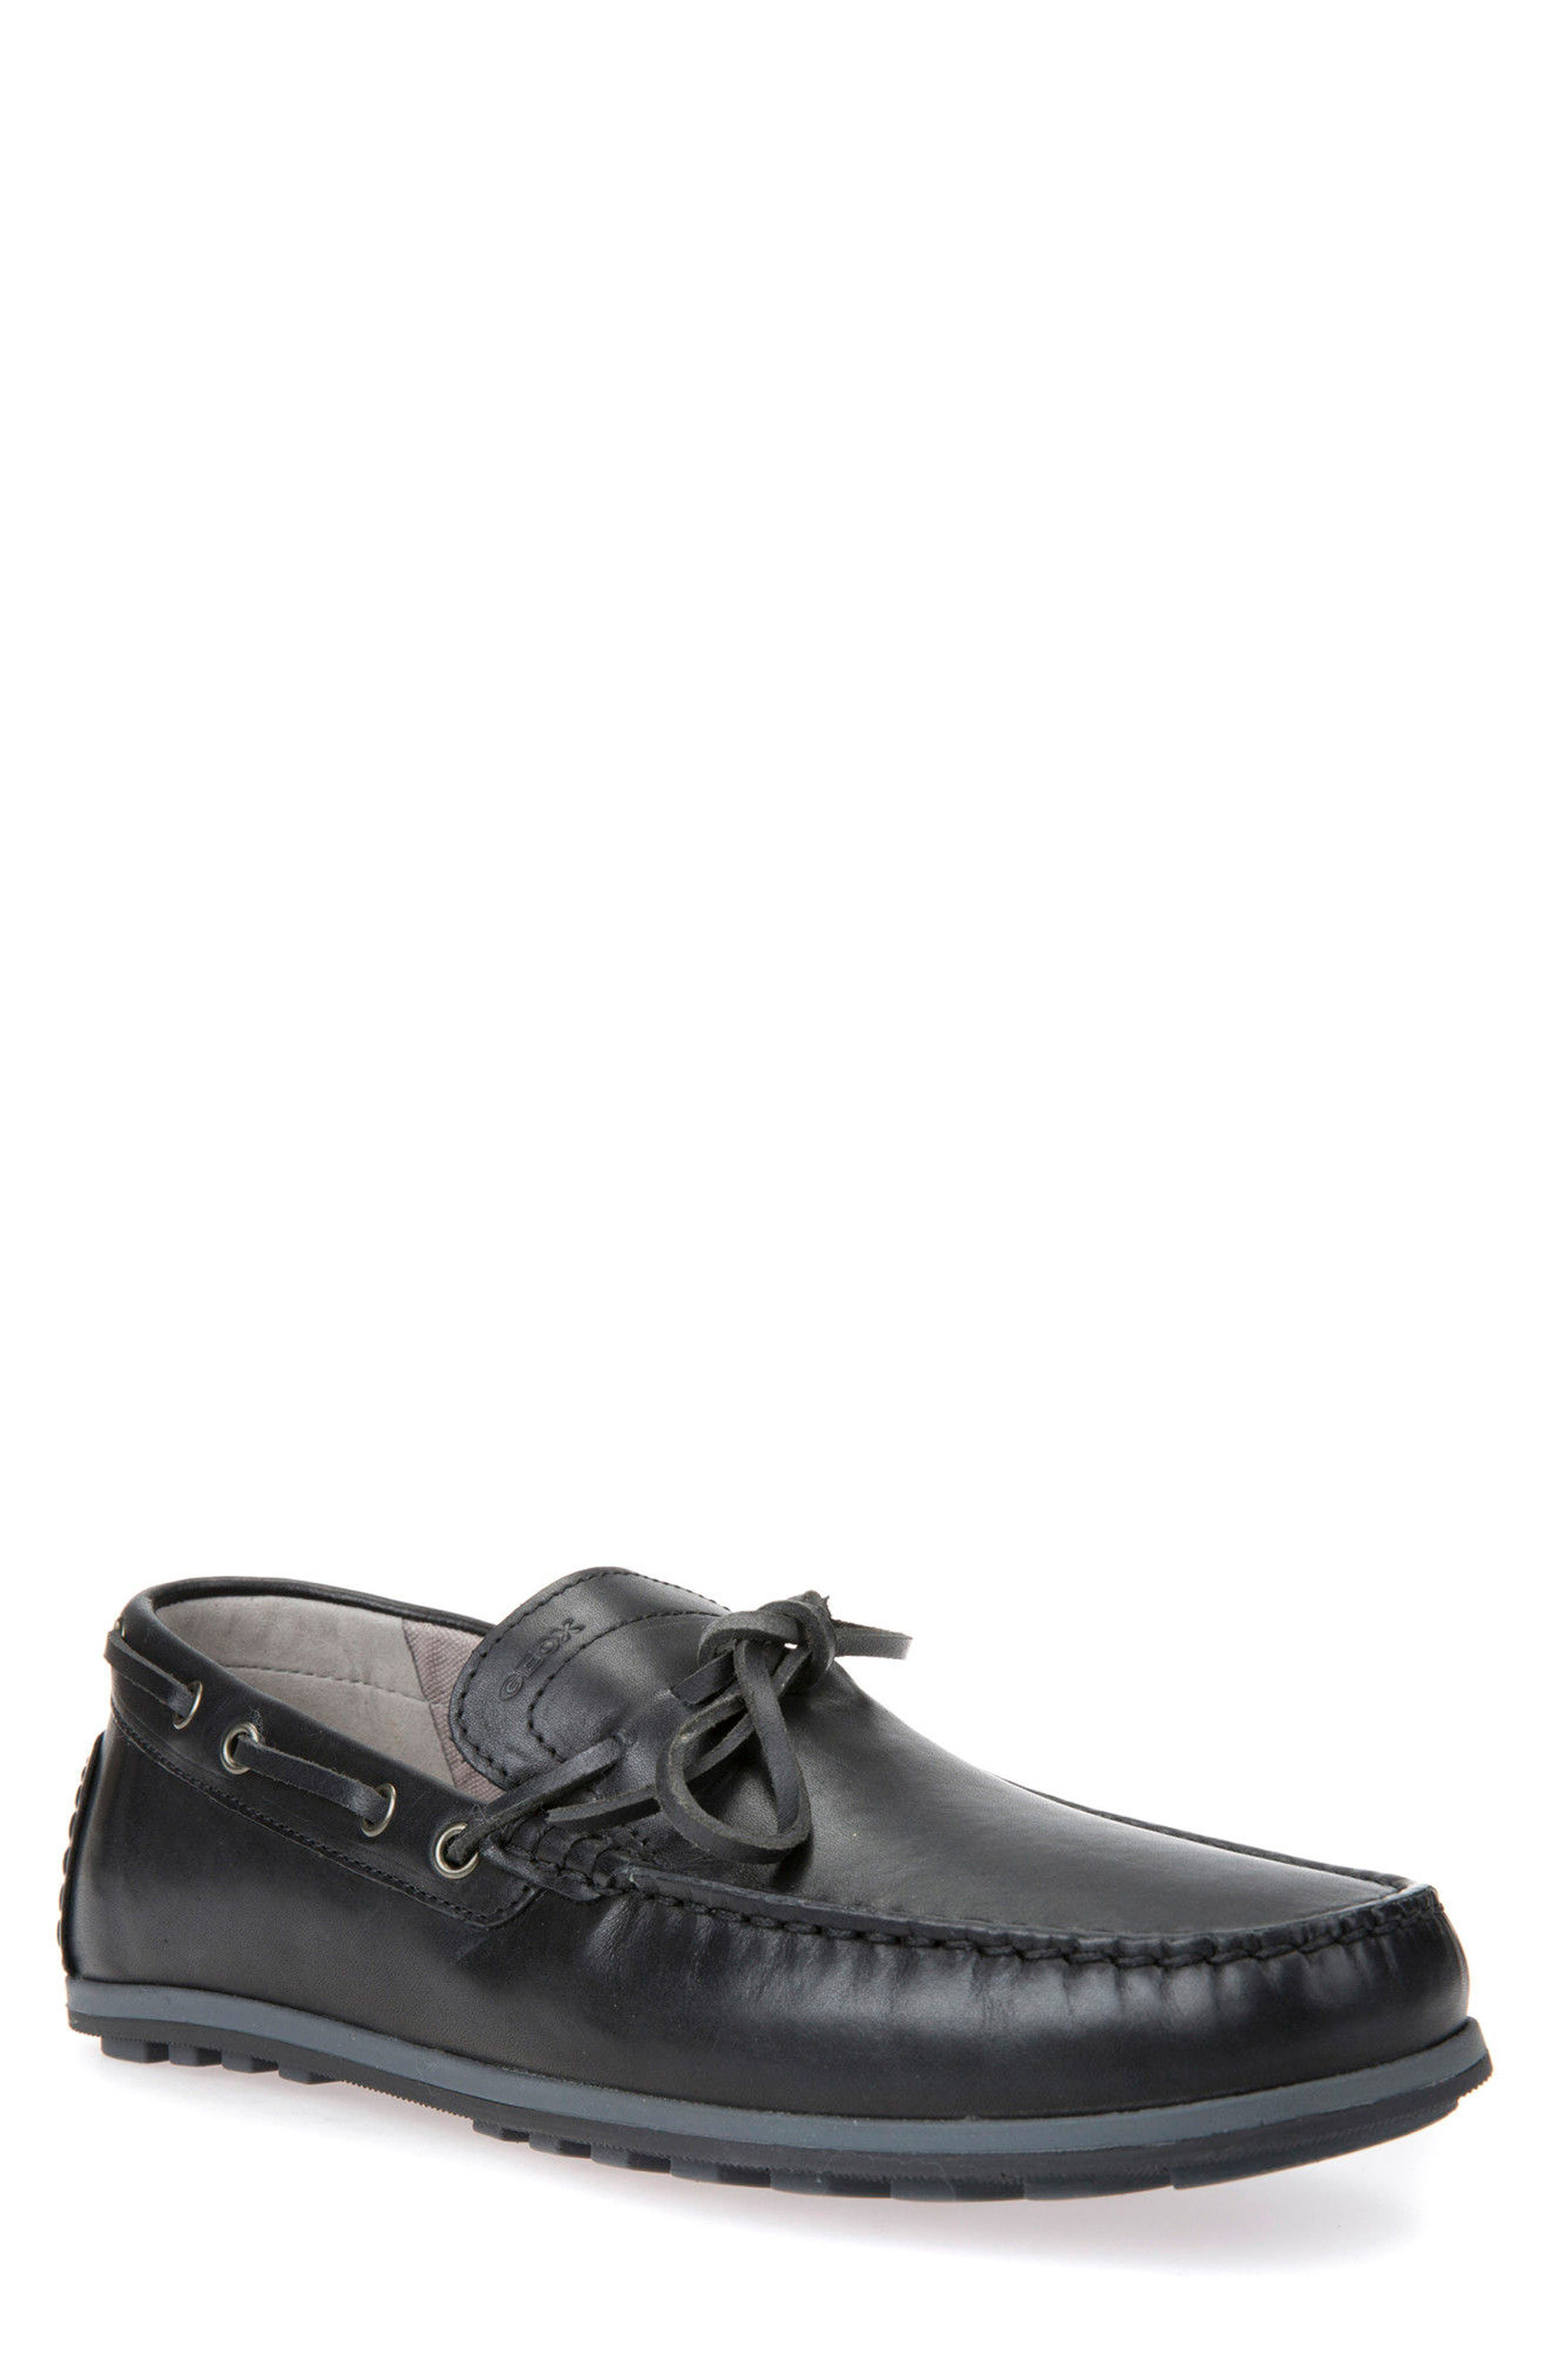 Geox Mirvin 3 Boat Shoe (Men)